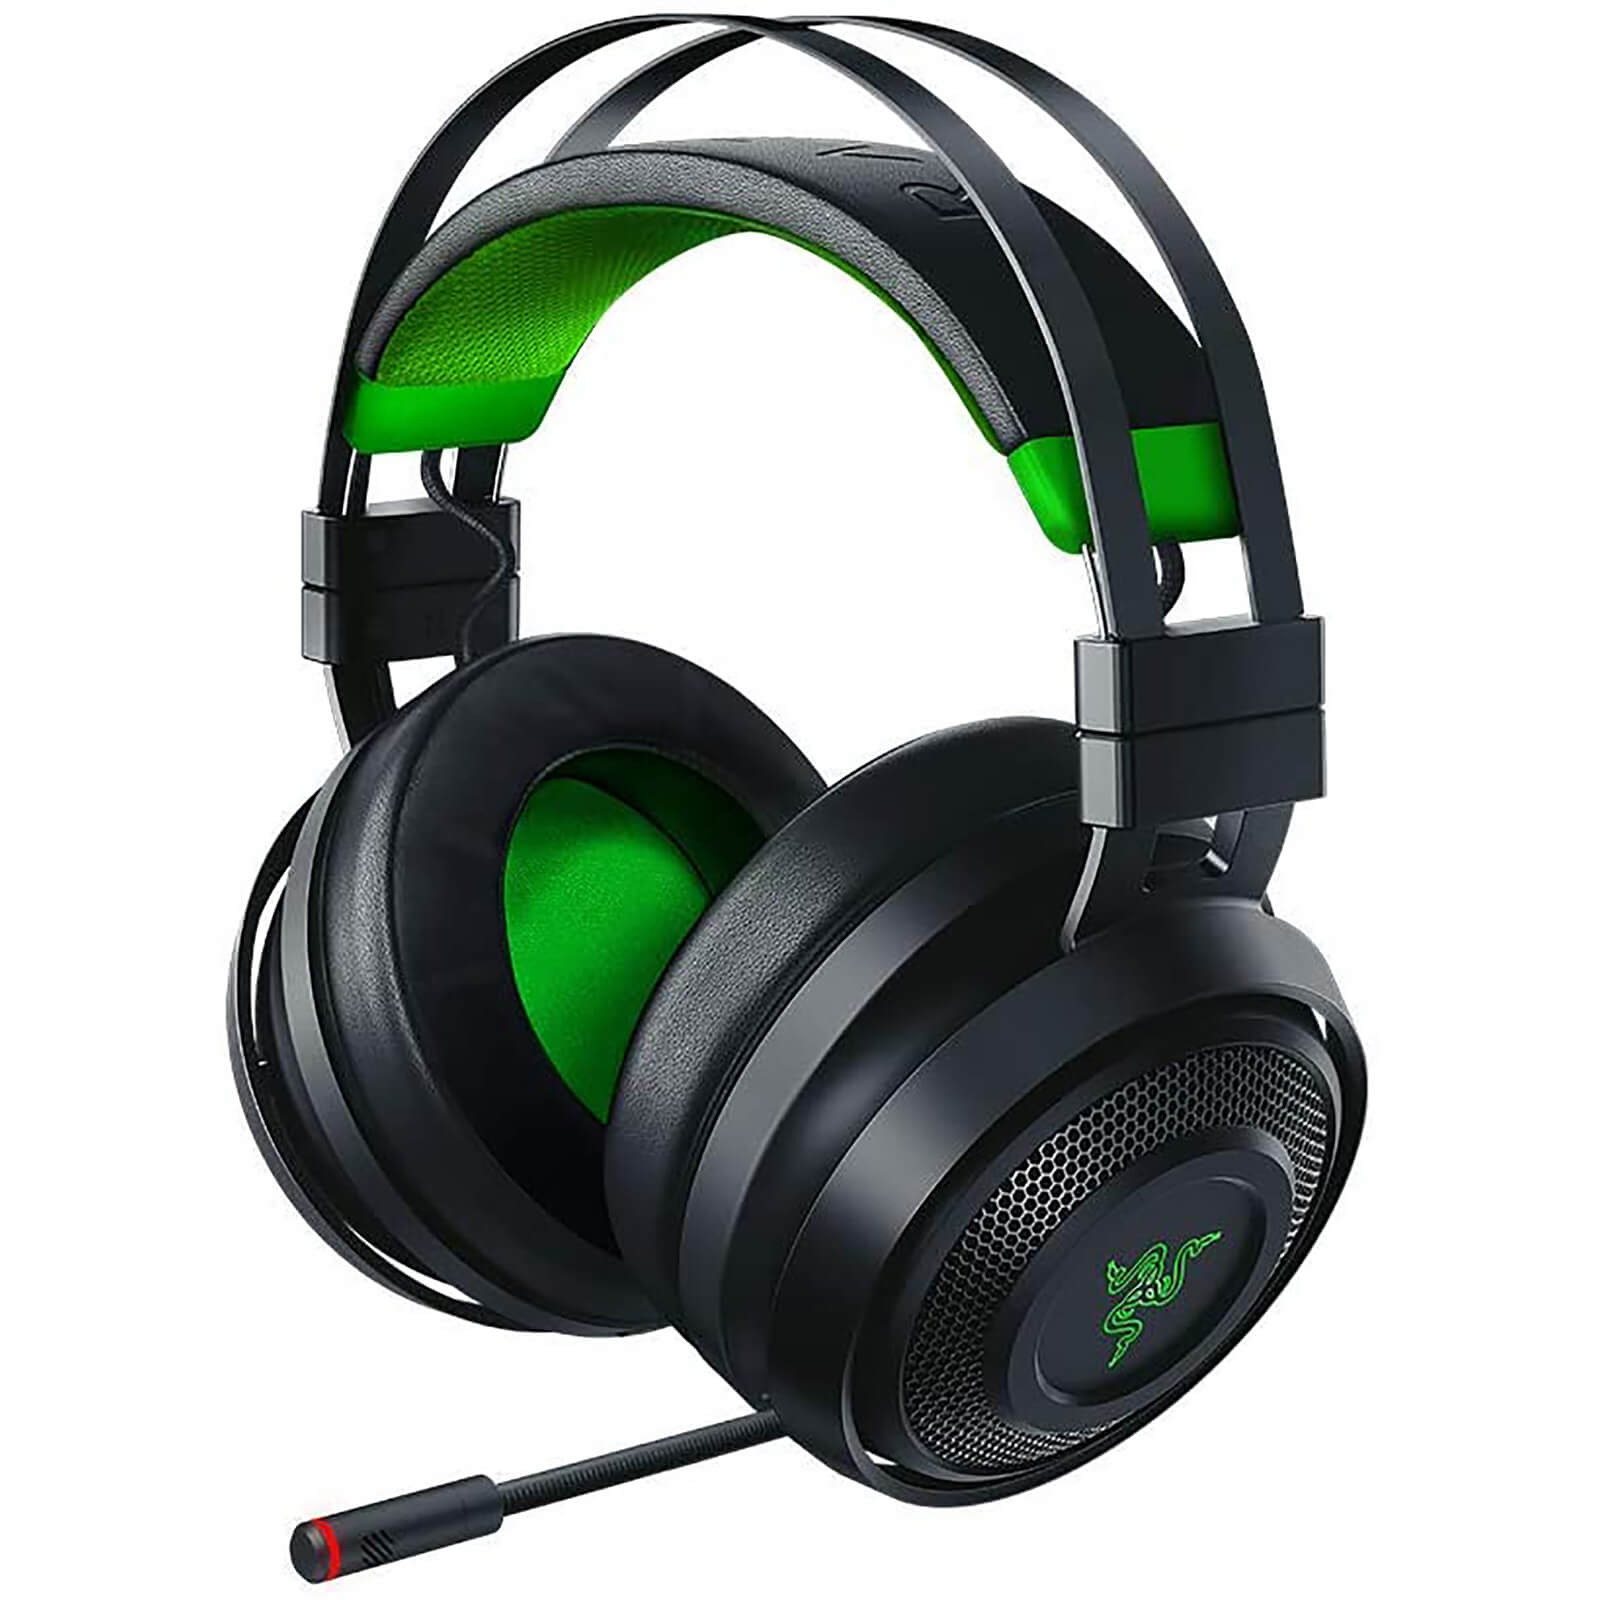 Razer Nari Ultimate for Xbox One - Wireless Gaming Headset...